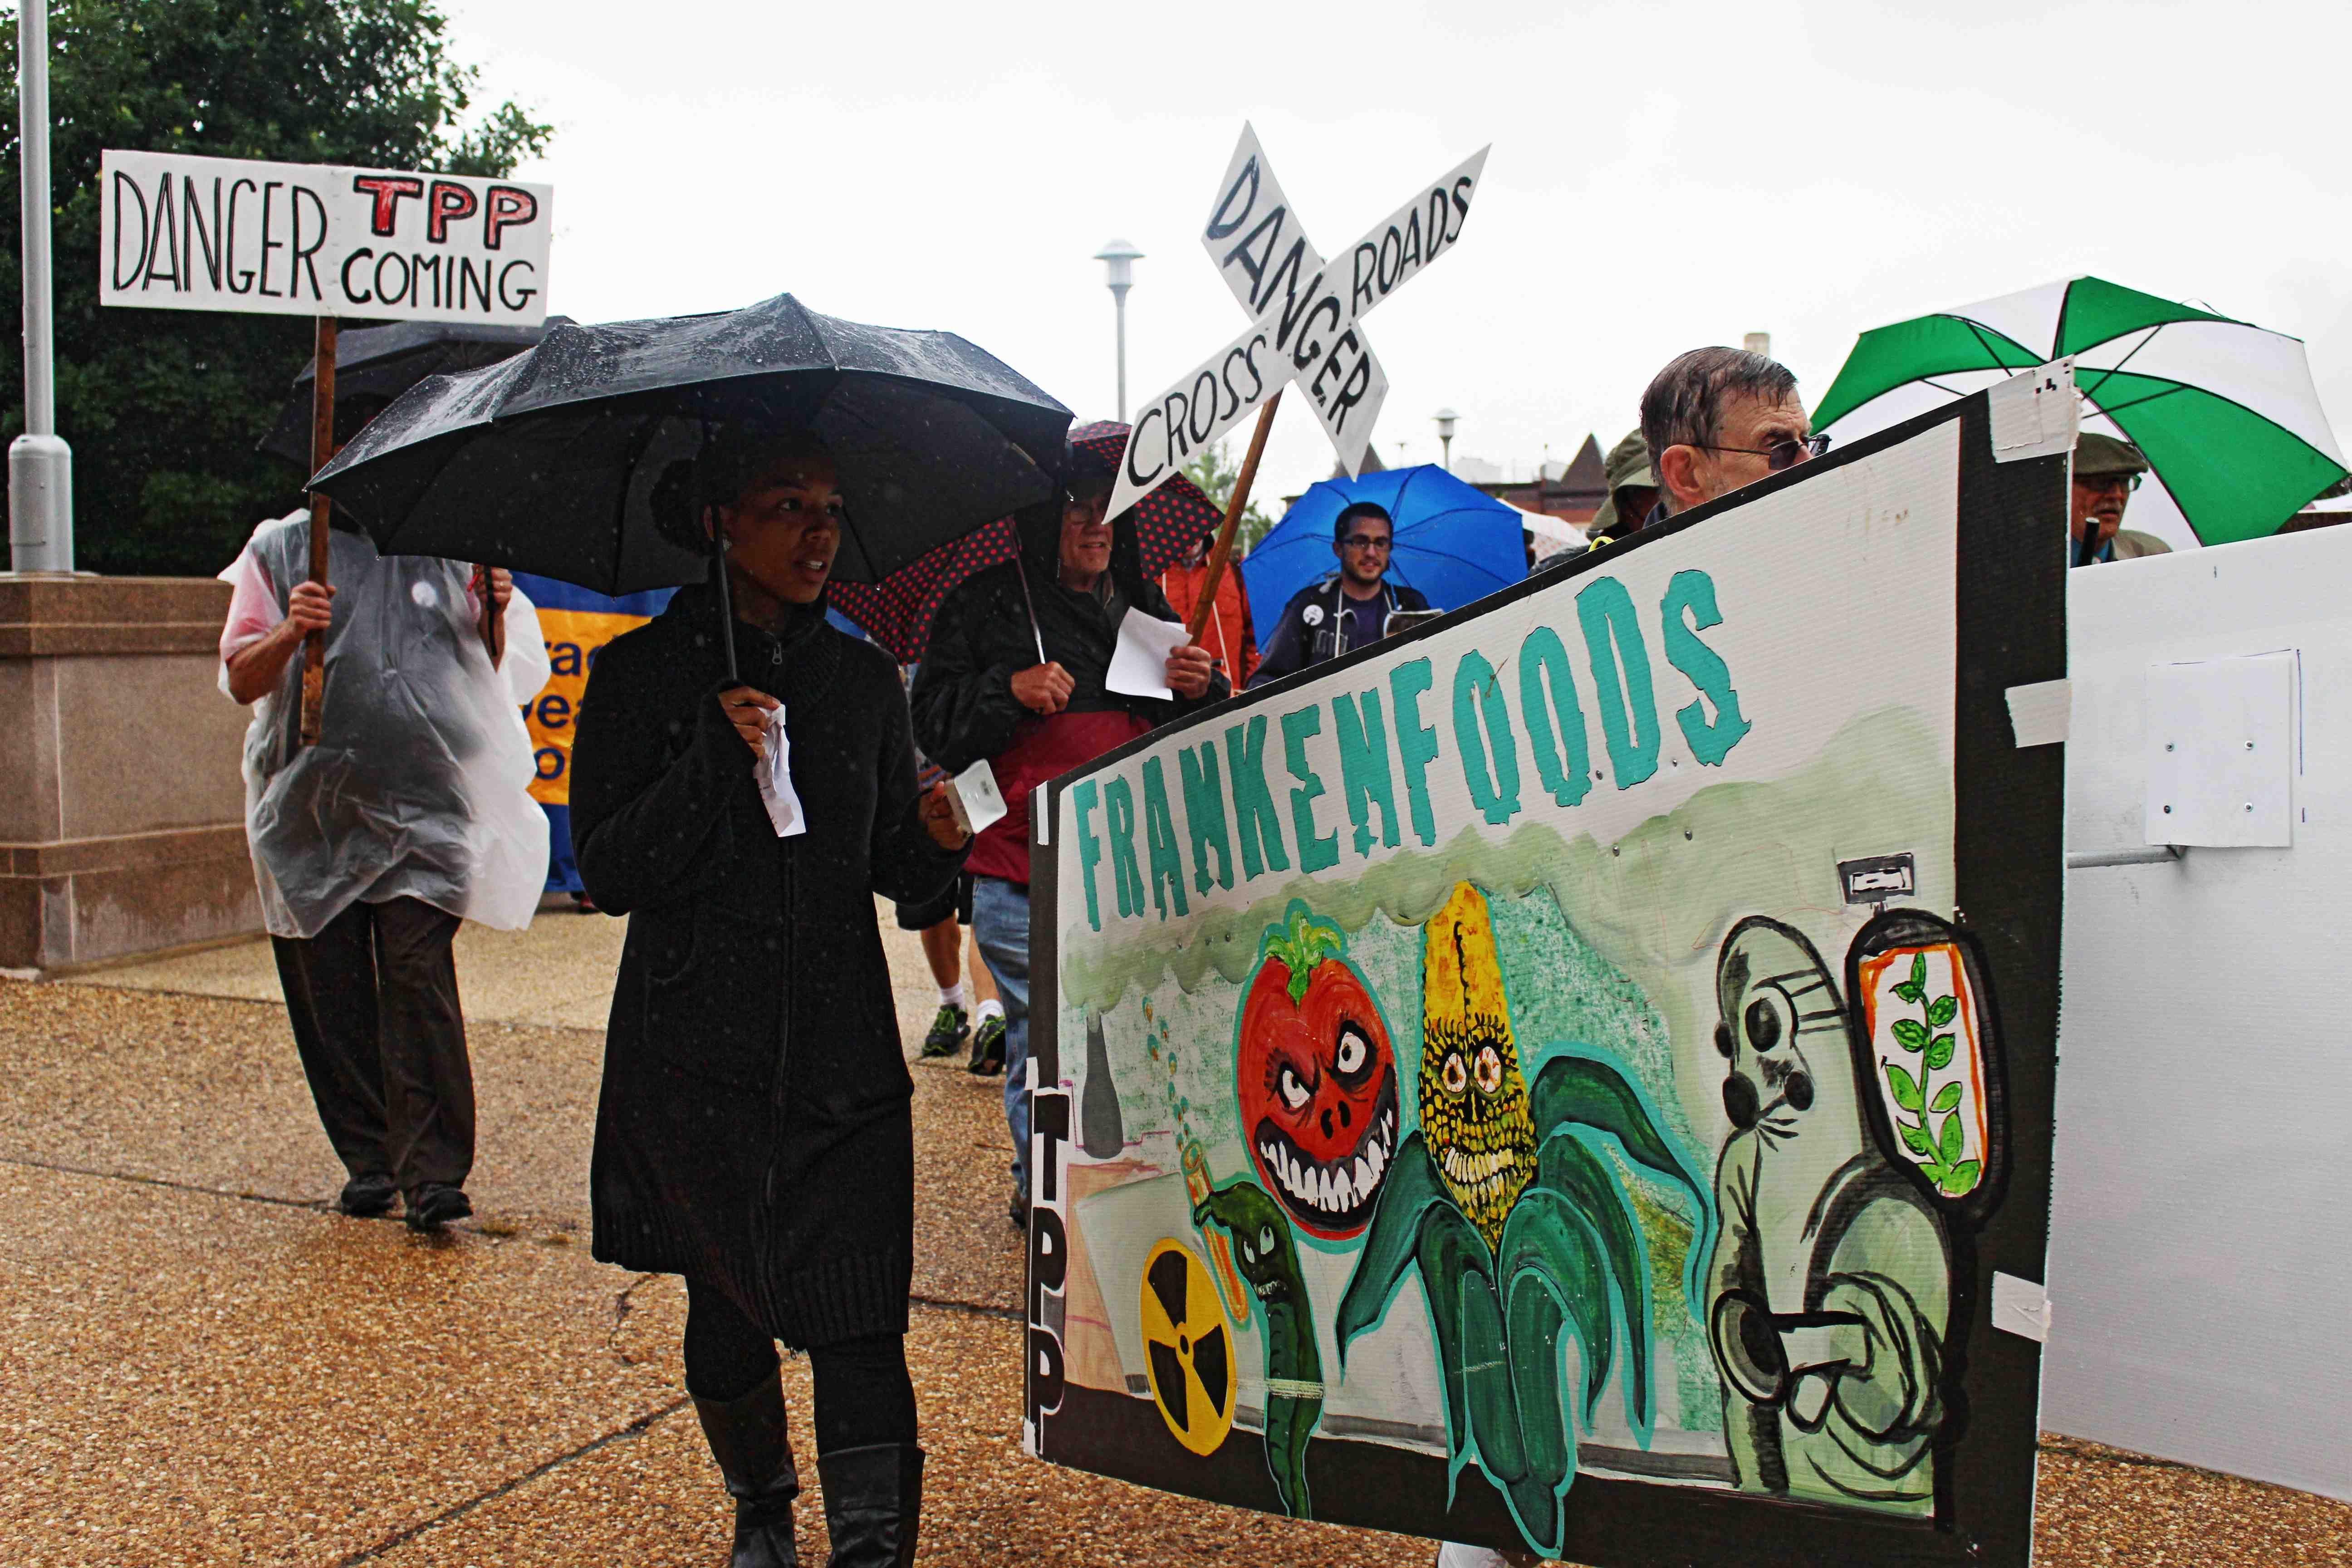 protest in the rain, creative activism